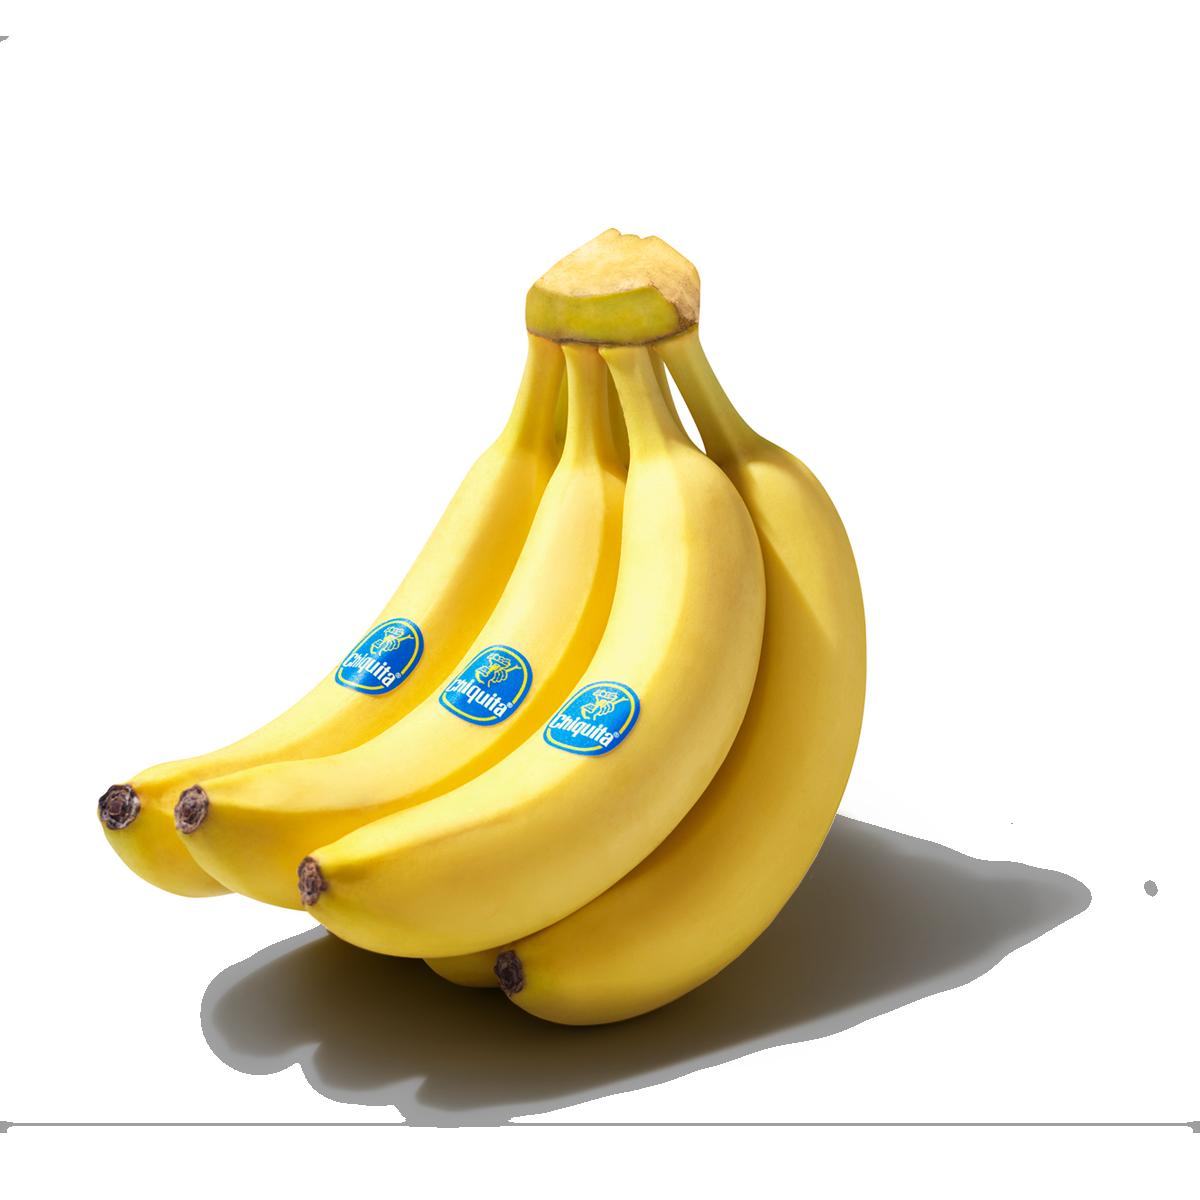 Anniversaire des bananes Chiquita